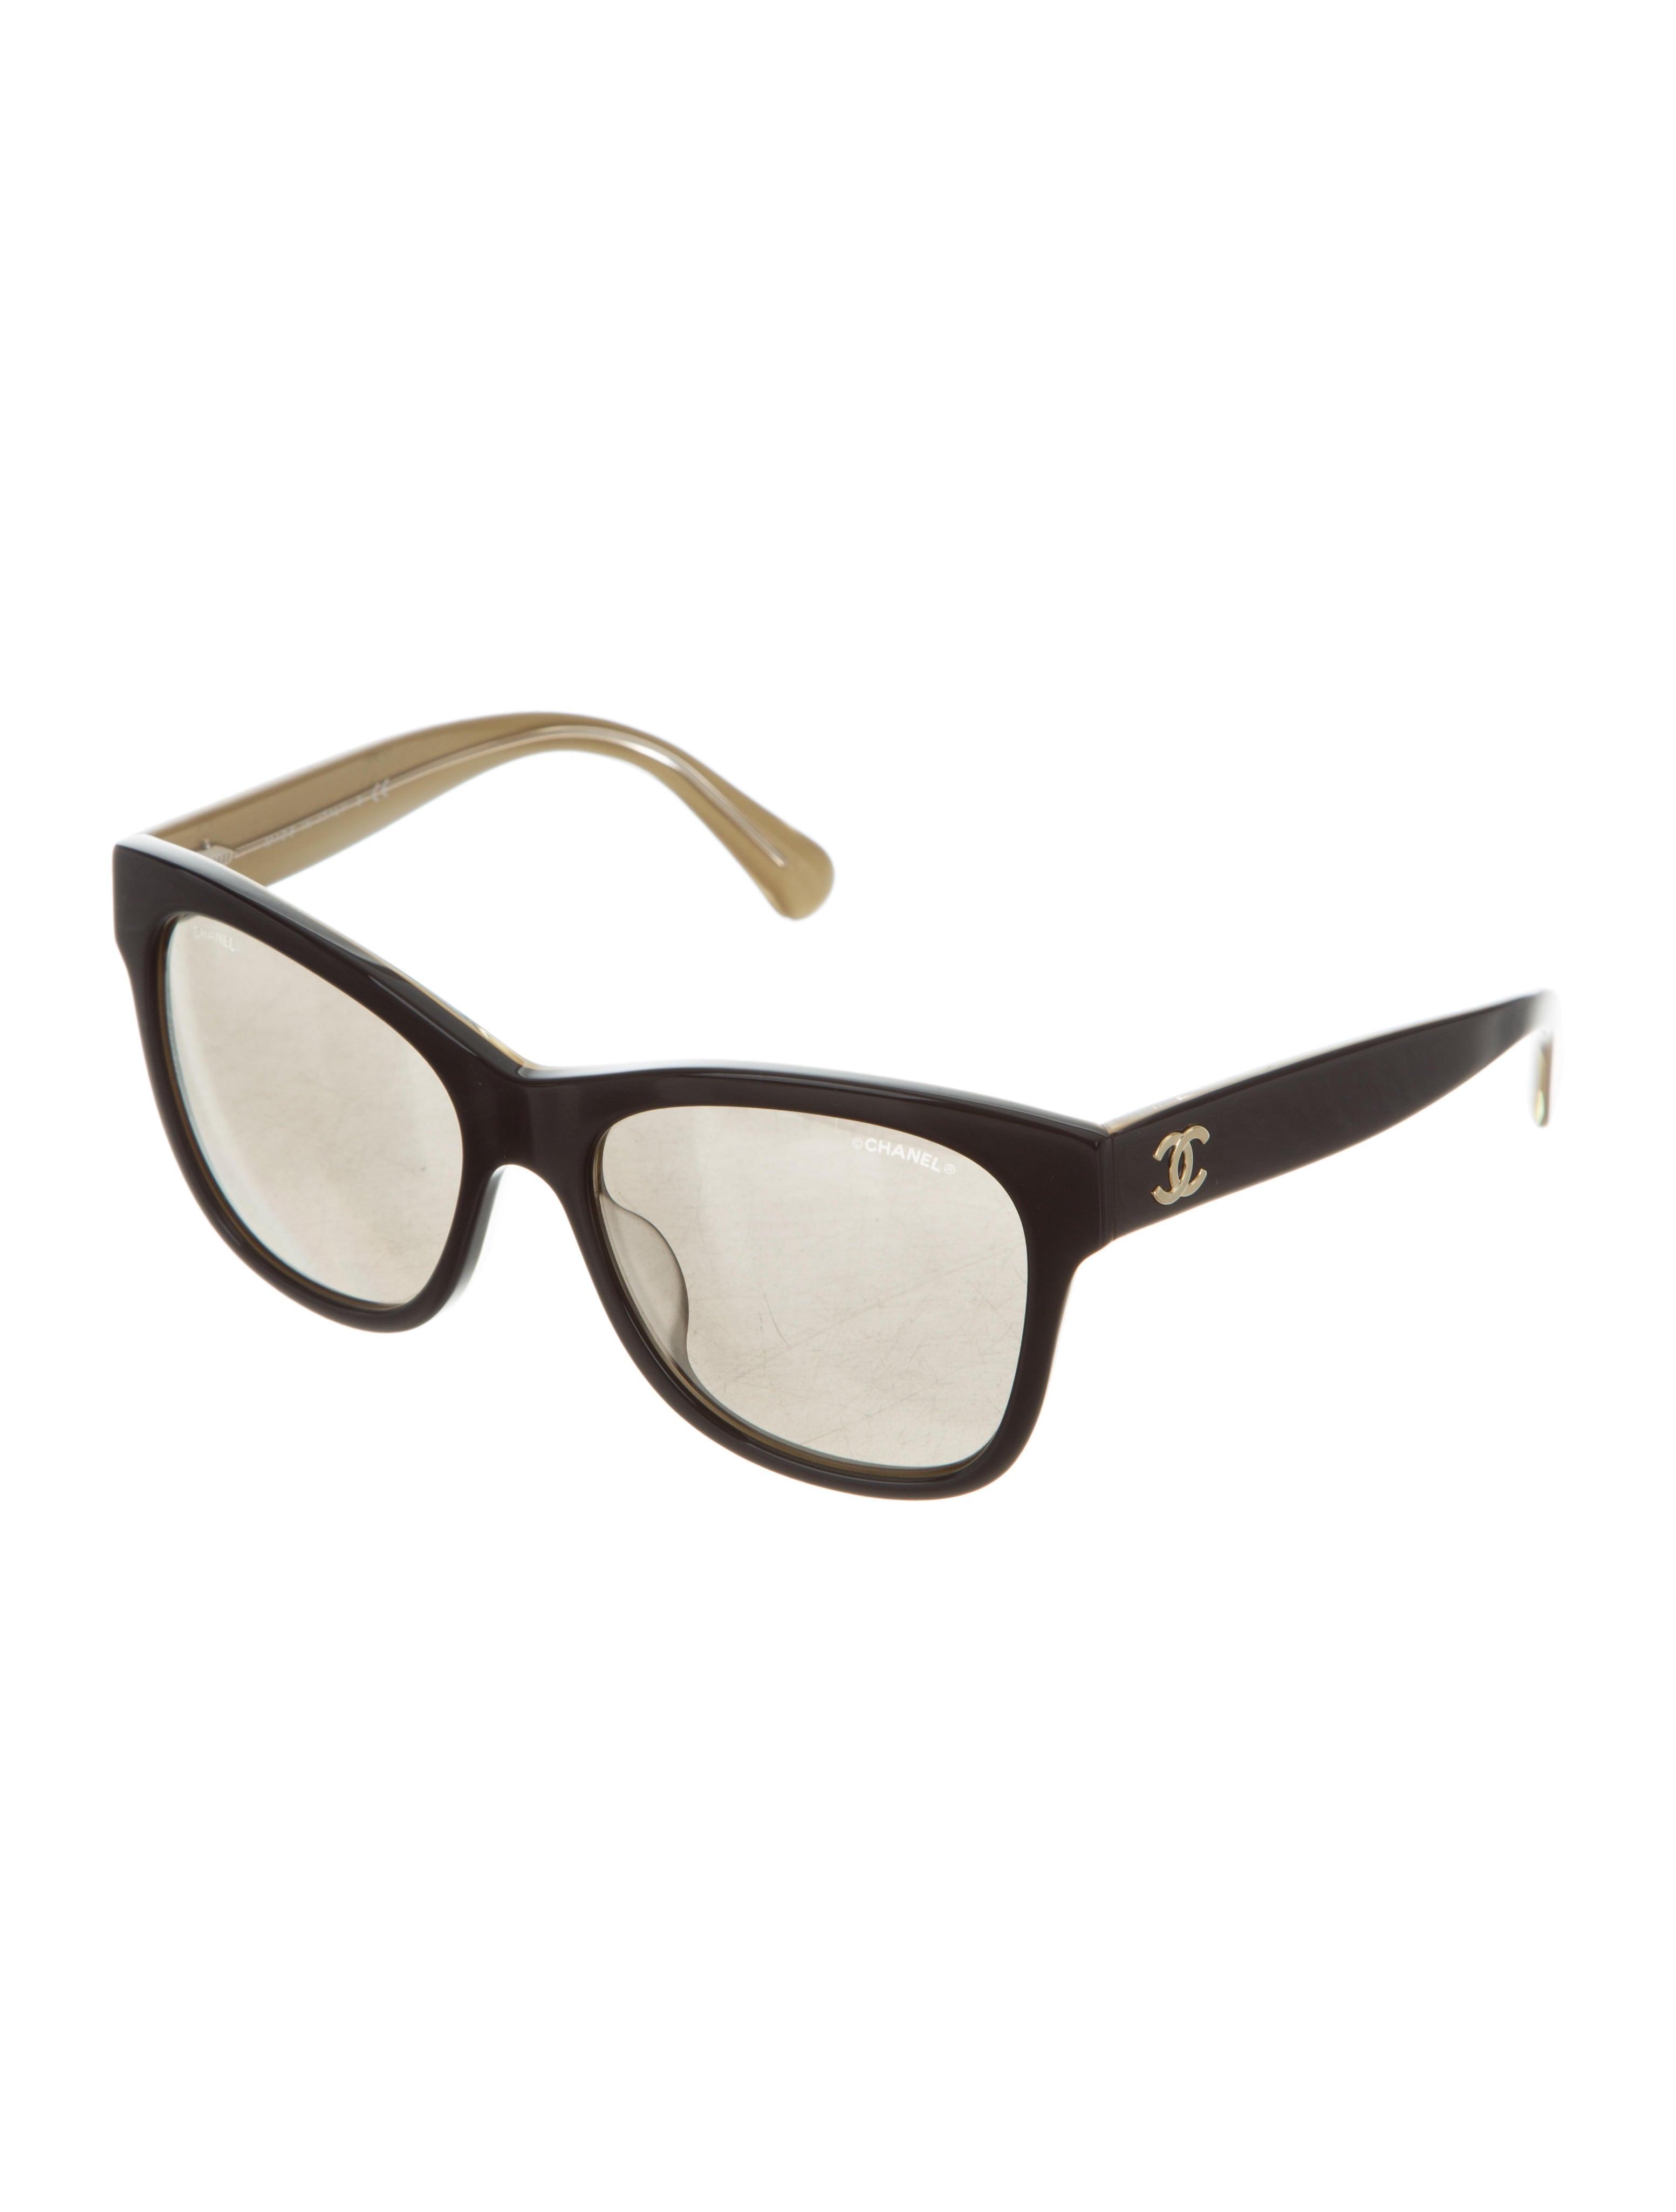 1c62cf39fb389 Chanel Womens Sunglasses 2017